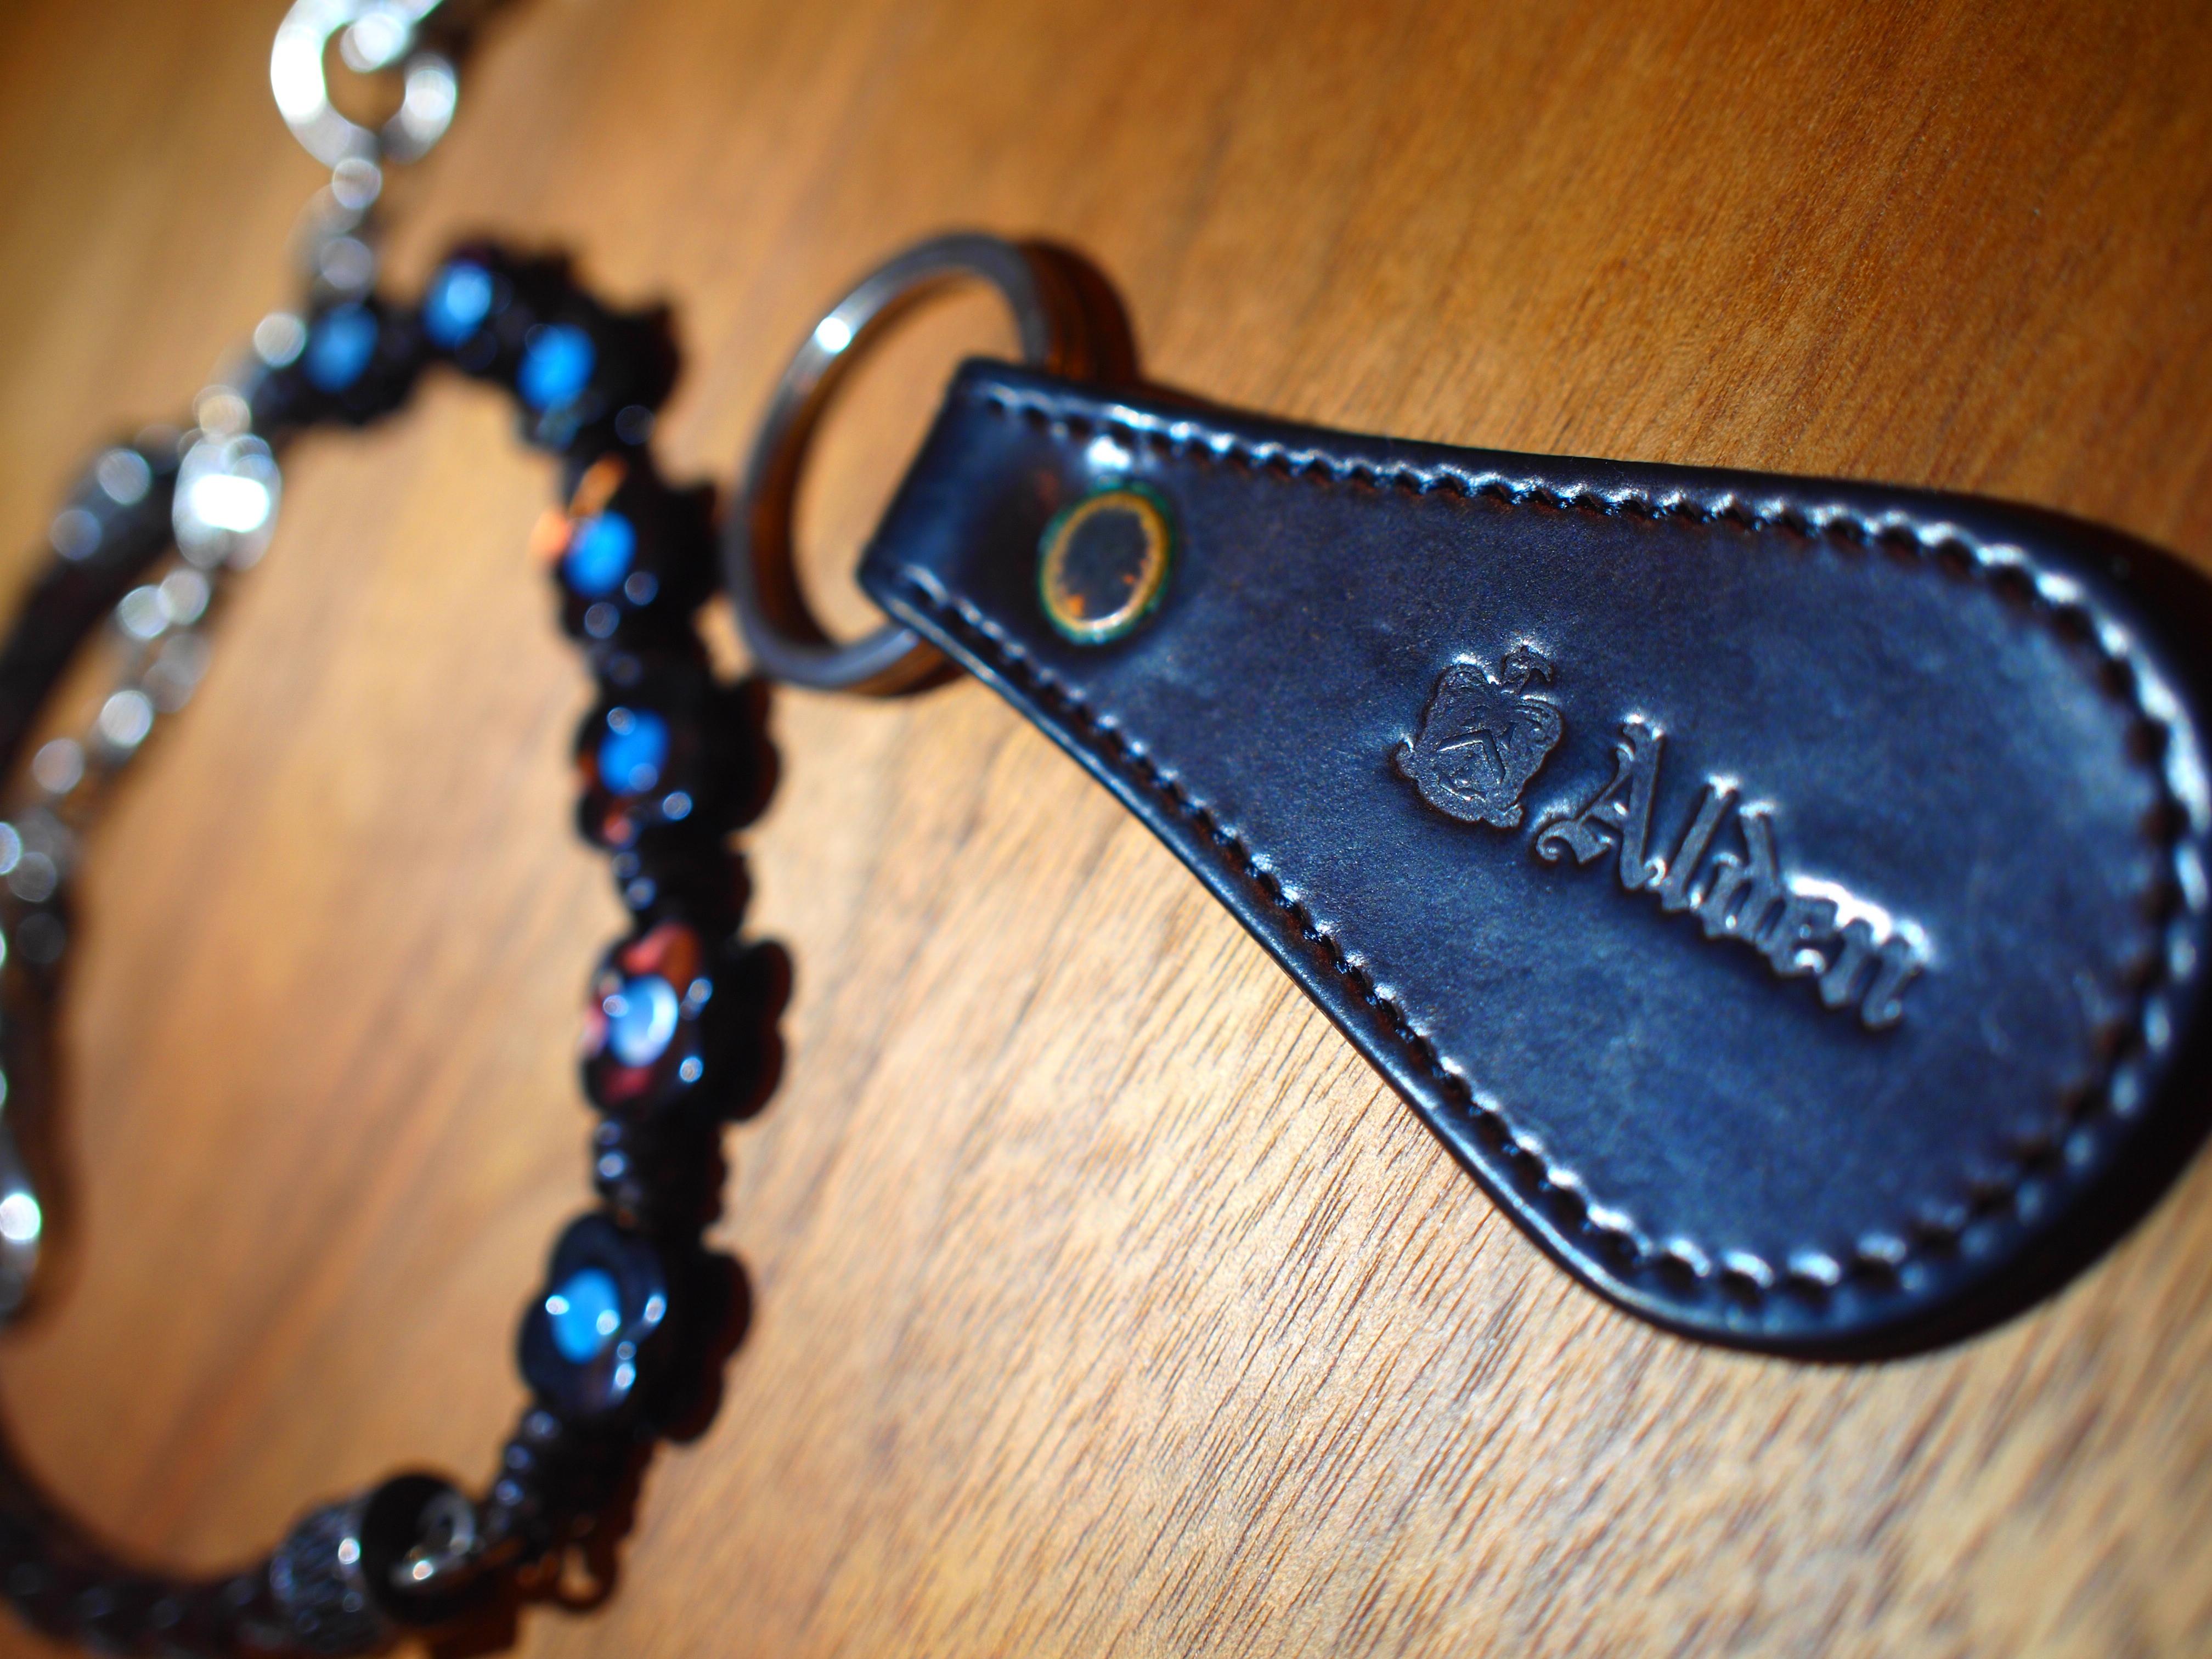 Alden key holder Lardini keychain